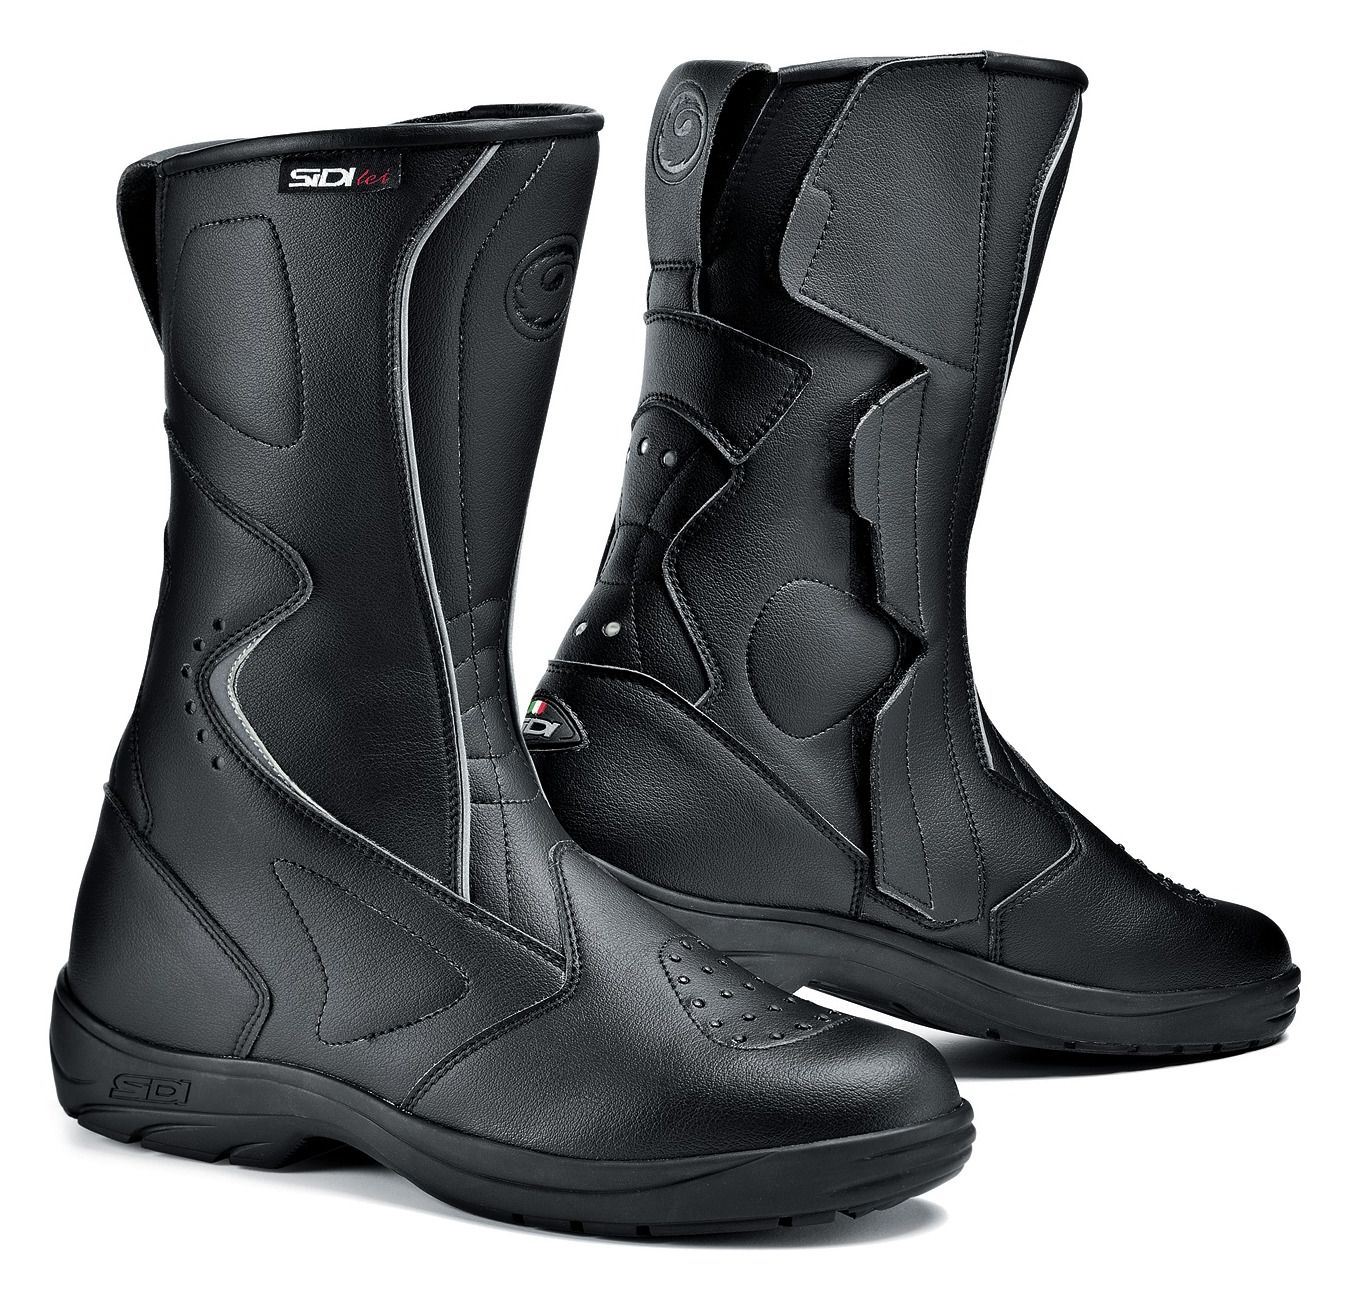 SIDI Livia Rain Women's Boots - RevZilla